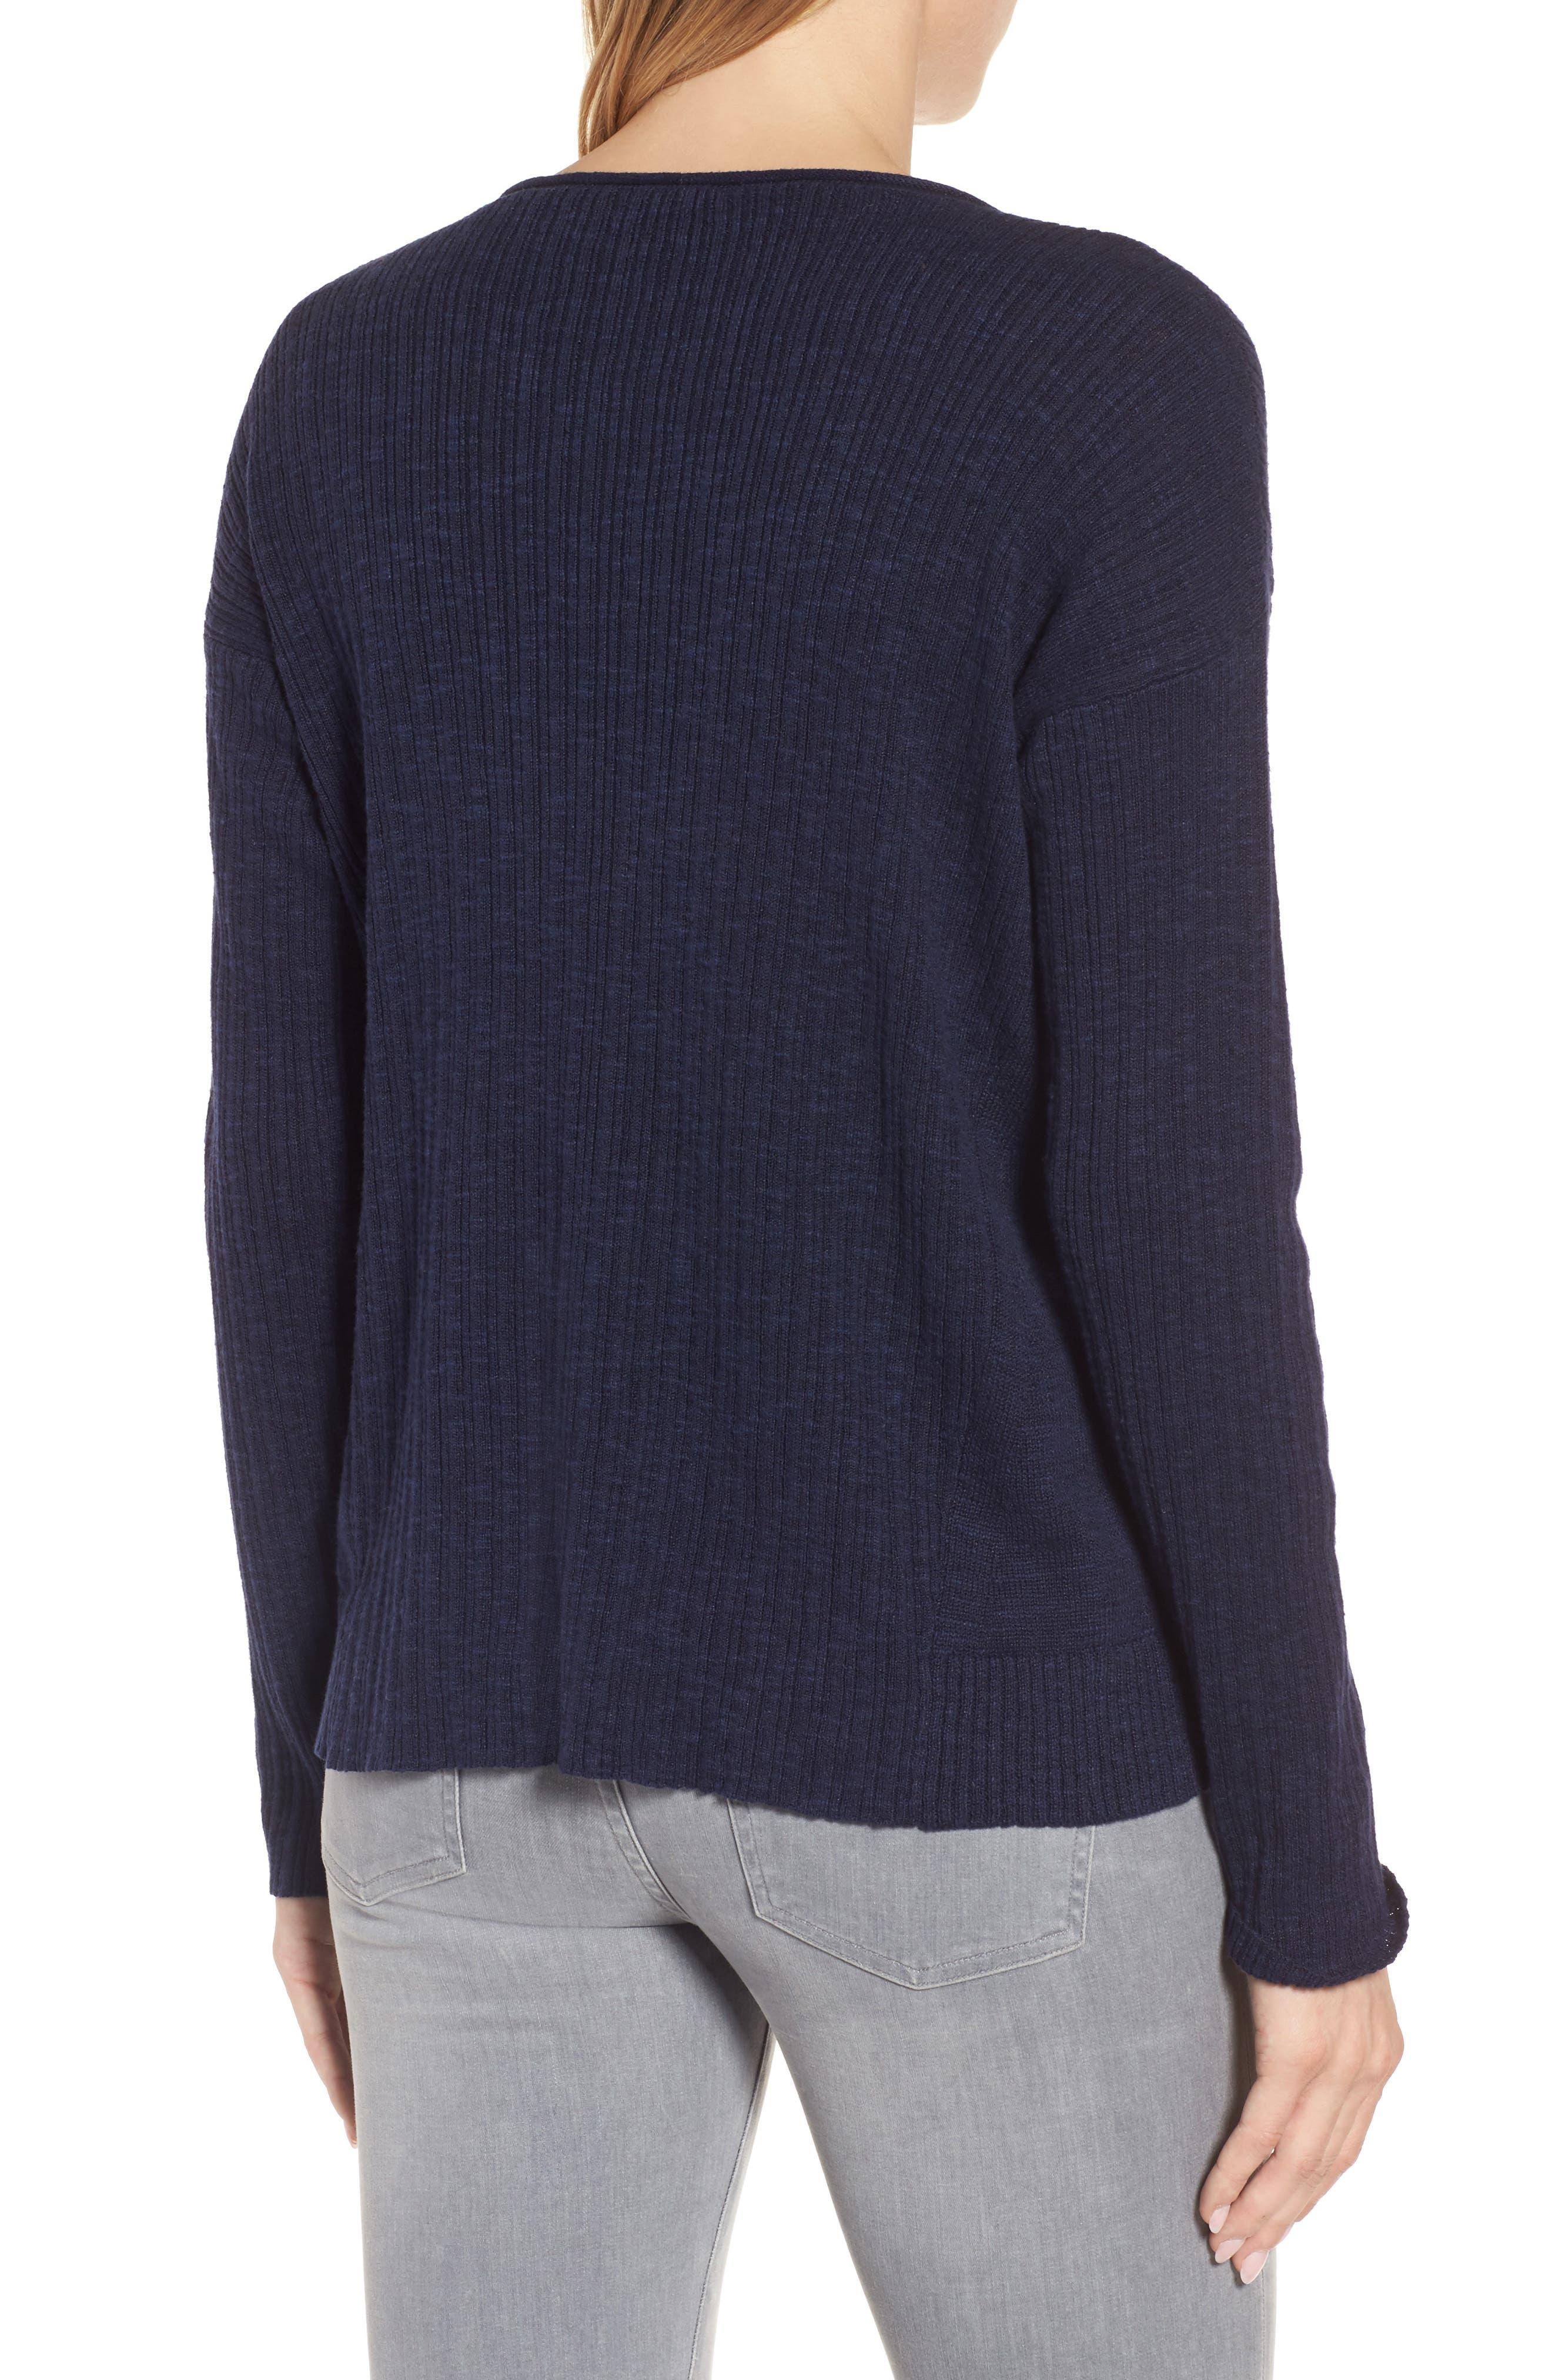 Organic Linen & Cotton Crewneck Sweater,                             Alternate thumbnail 10, color,